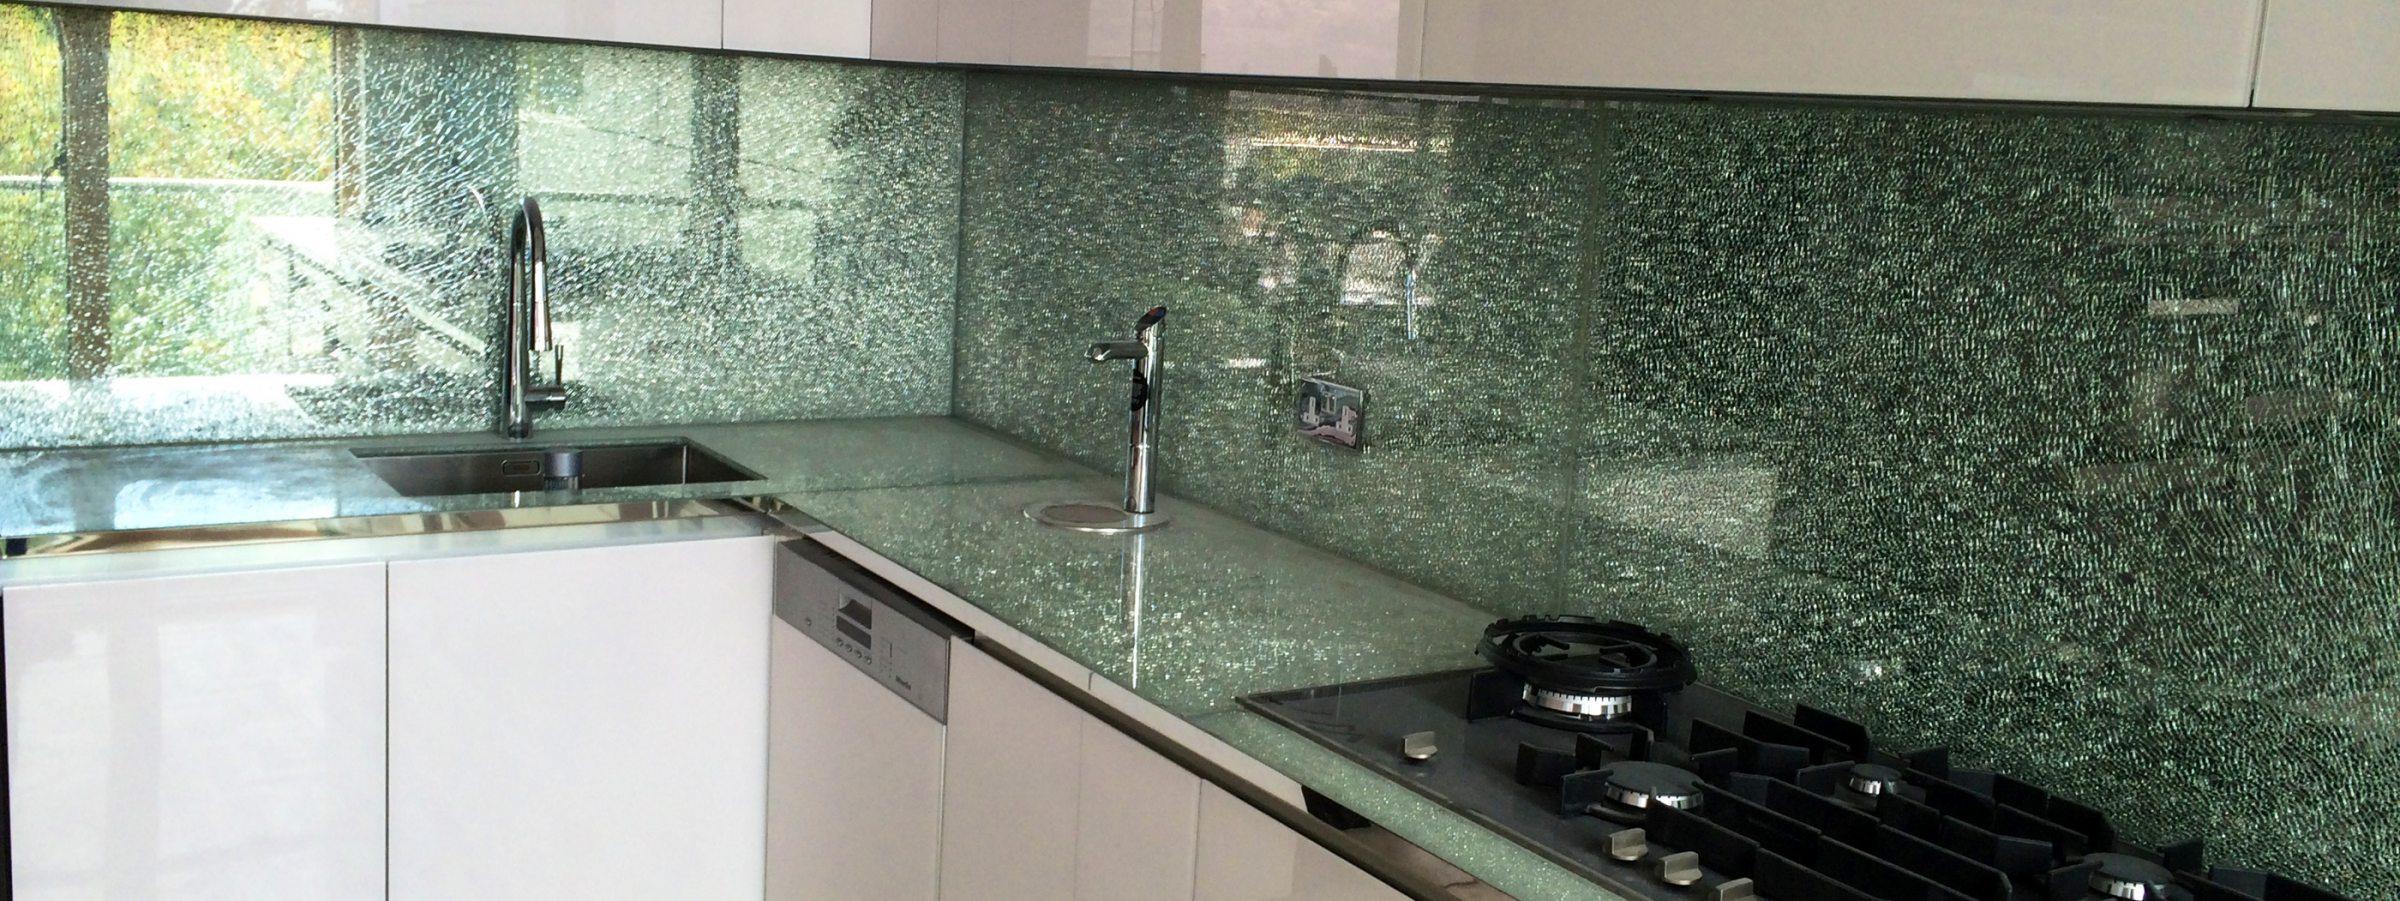 Crackle Glass Splashbacks and Worktop